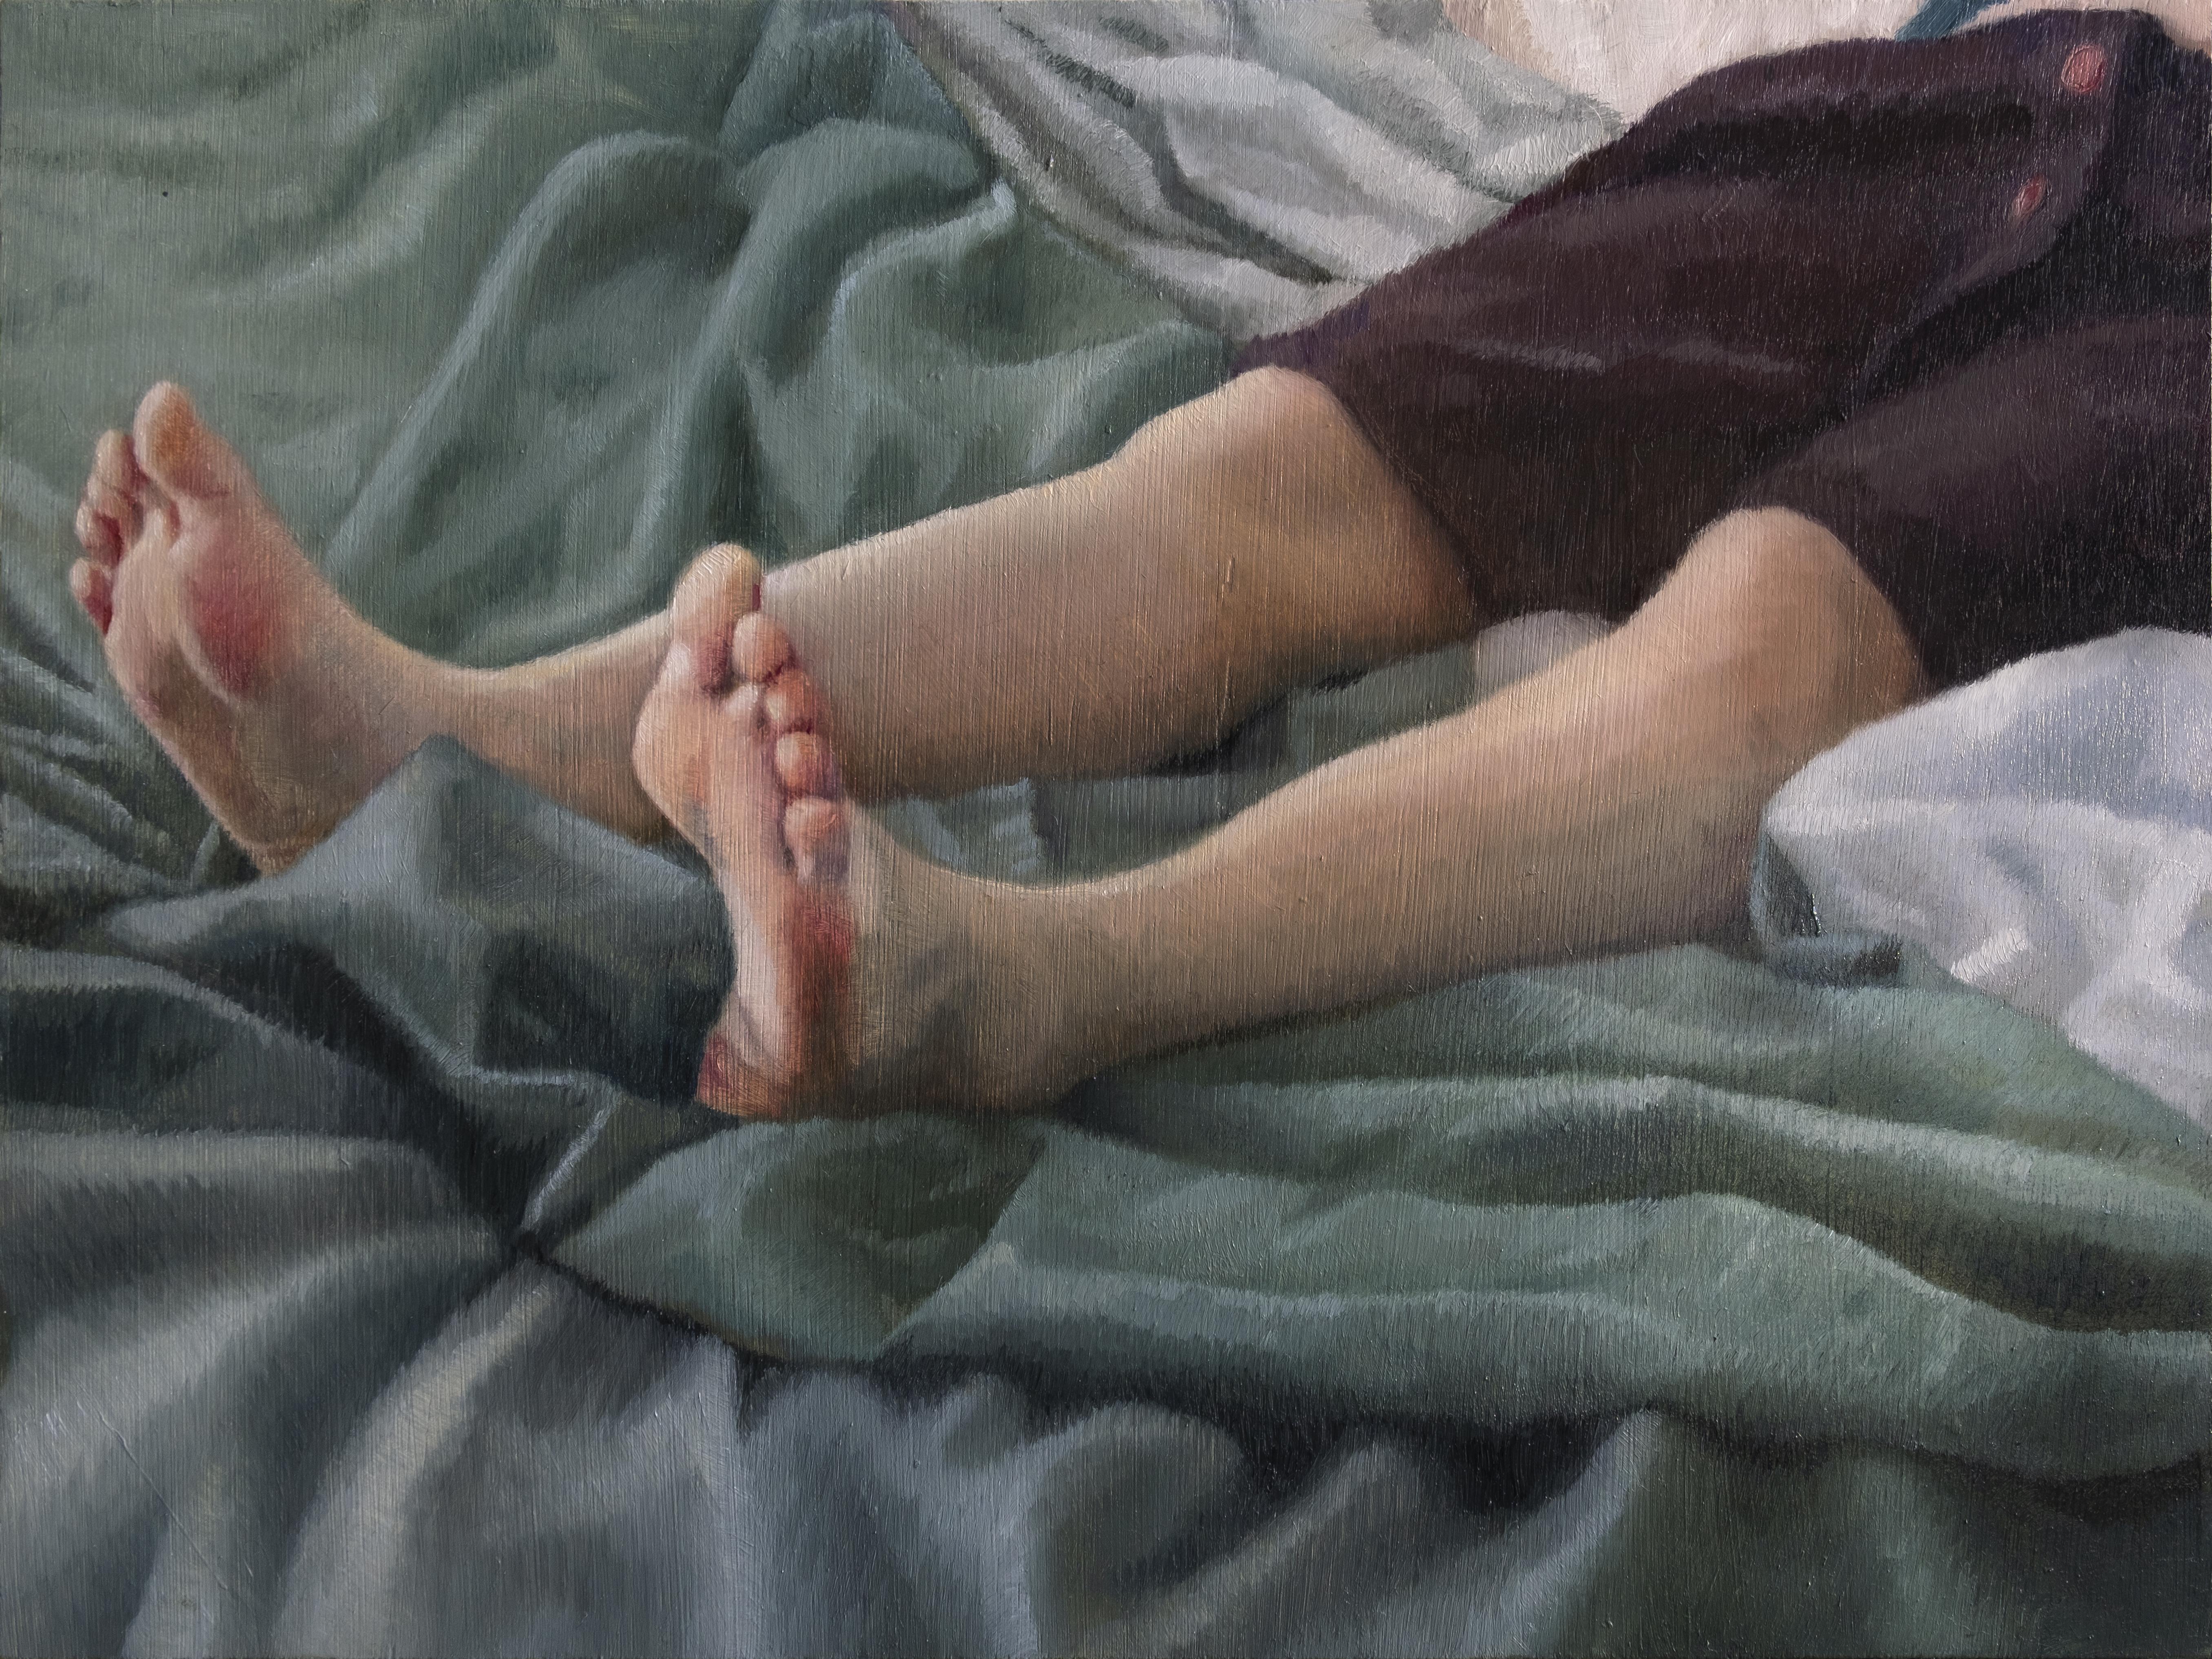 Anna Calleja, Fate, oil on panel, 30x40cm, 2020